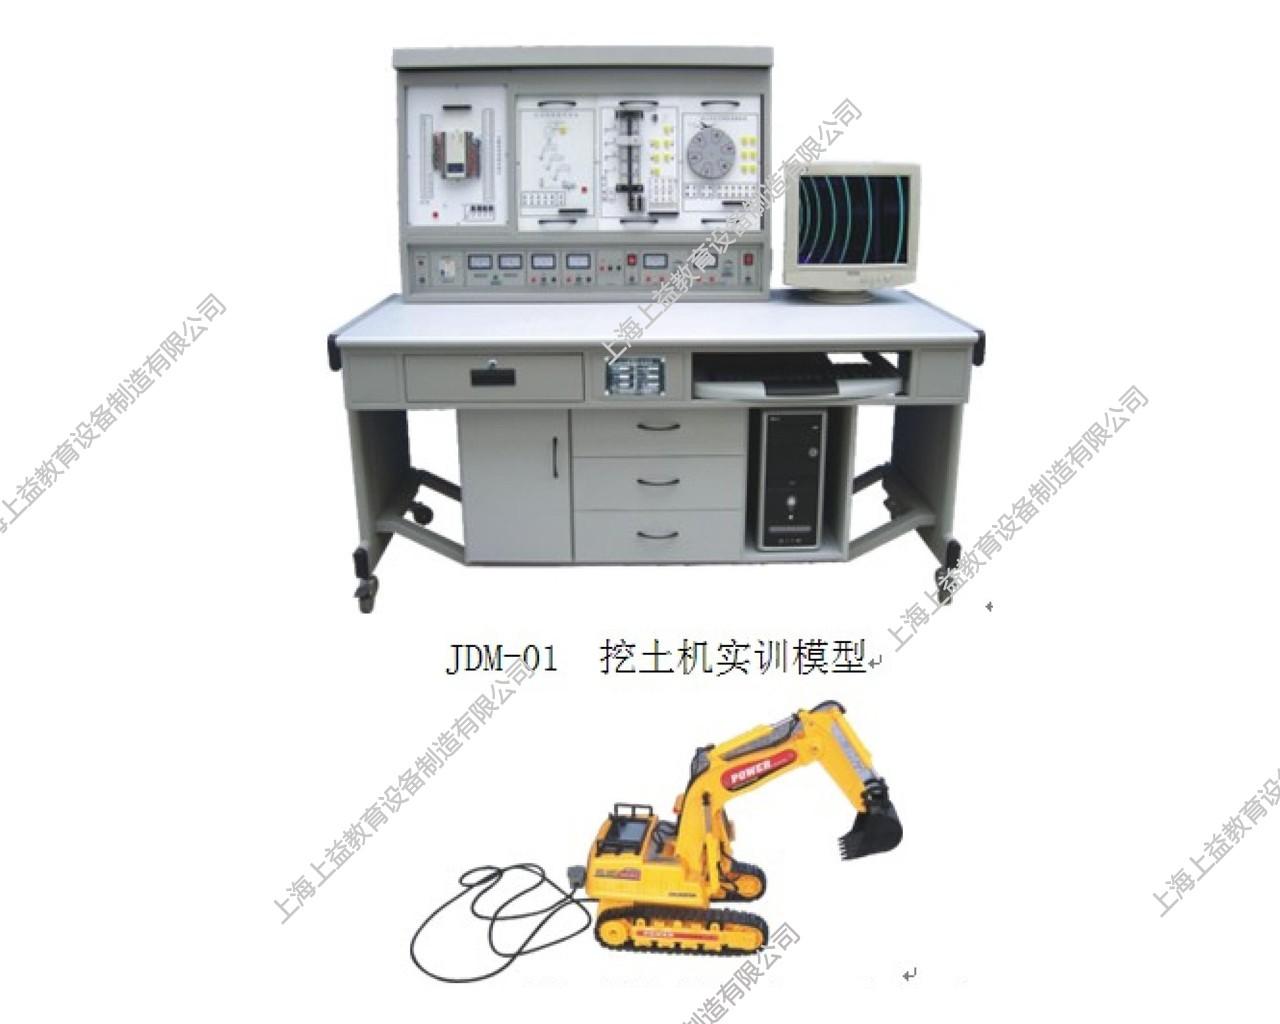 SYPLC-103C网络型PLC可编程控制/单片机实验开发系统自动控制原理/综合实验装置(立式、挂箱积木式)